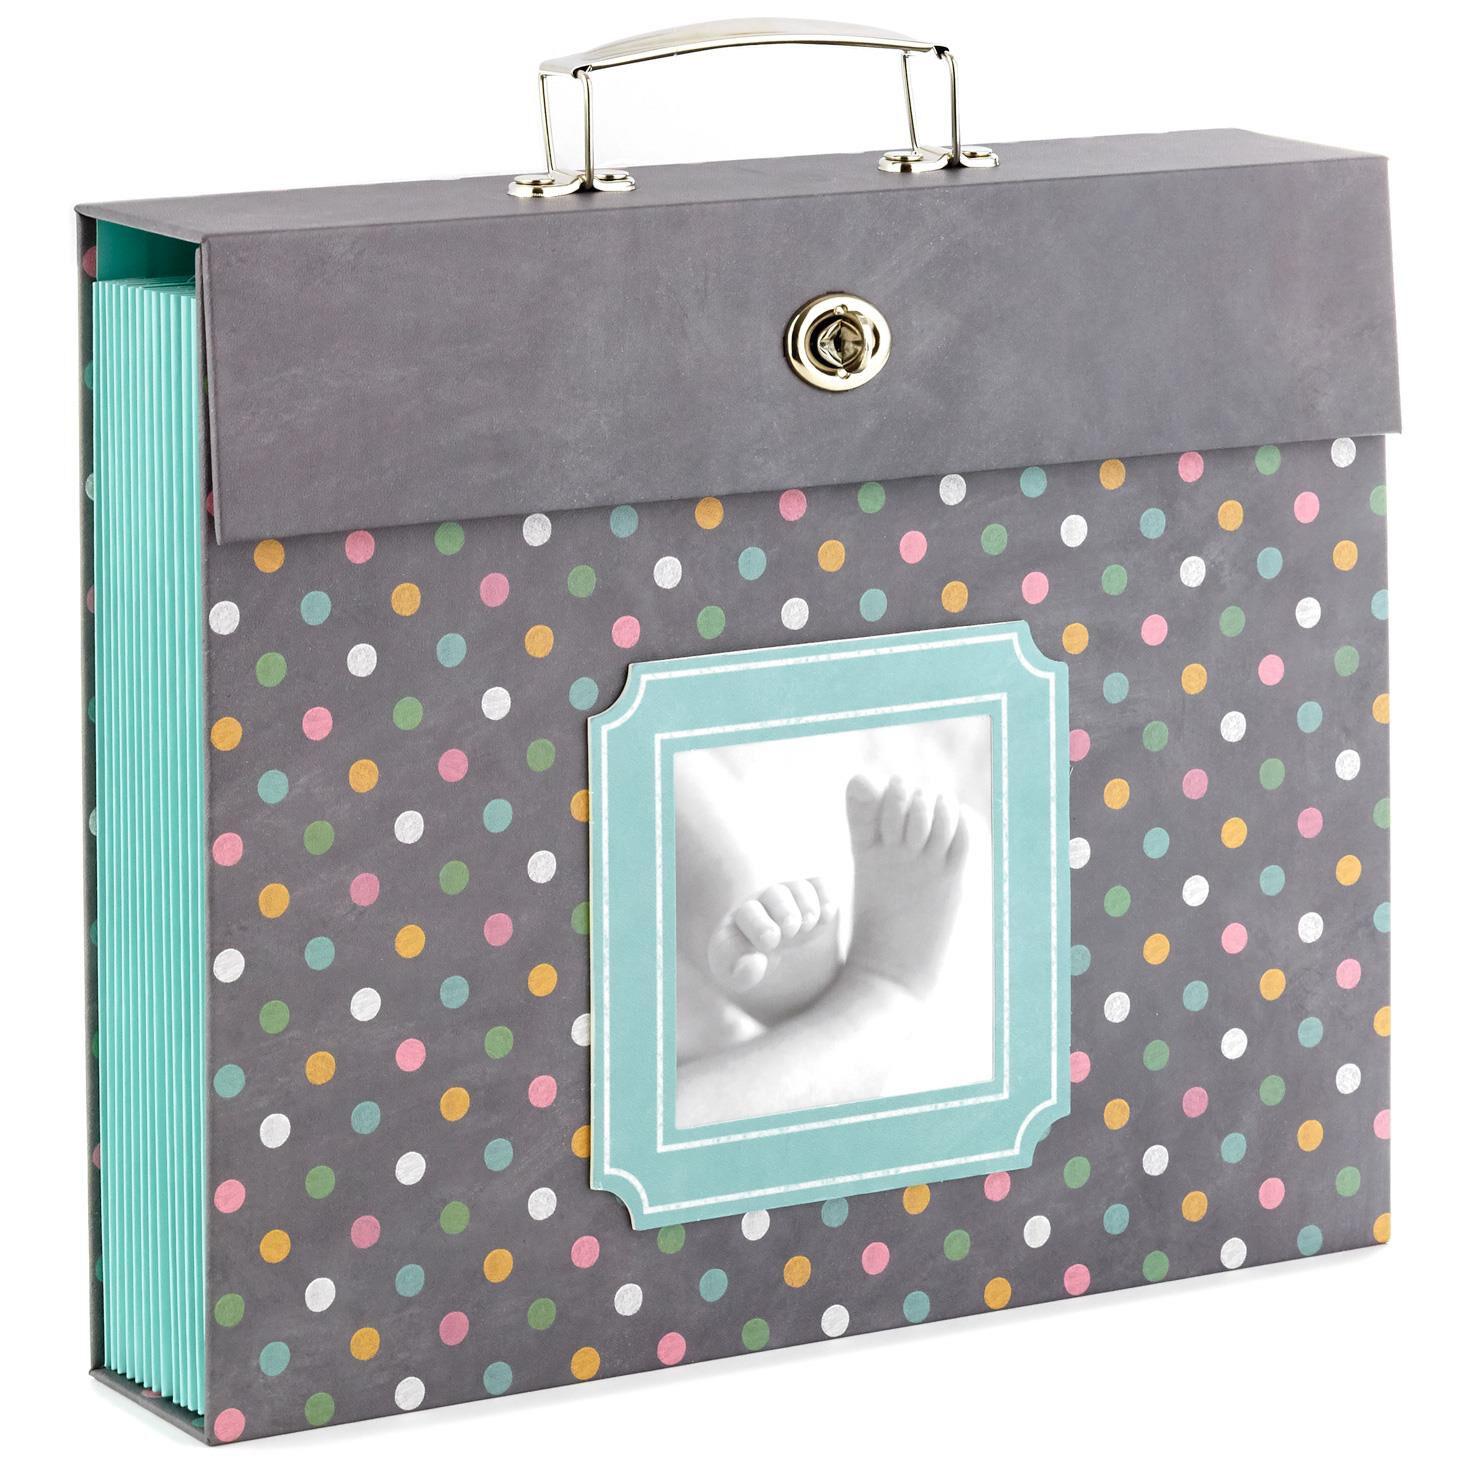 polka dot baby accordion file folder organizer - Accordion Folder